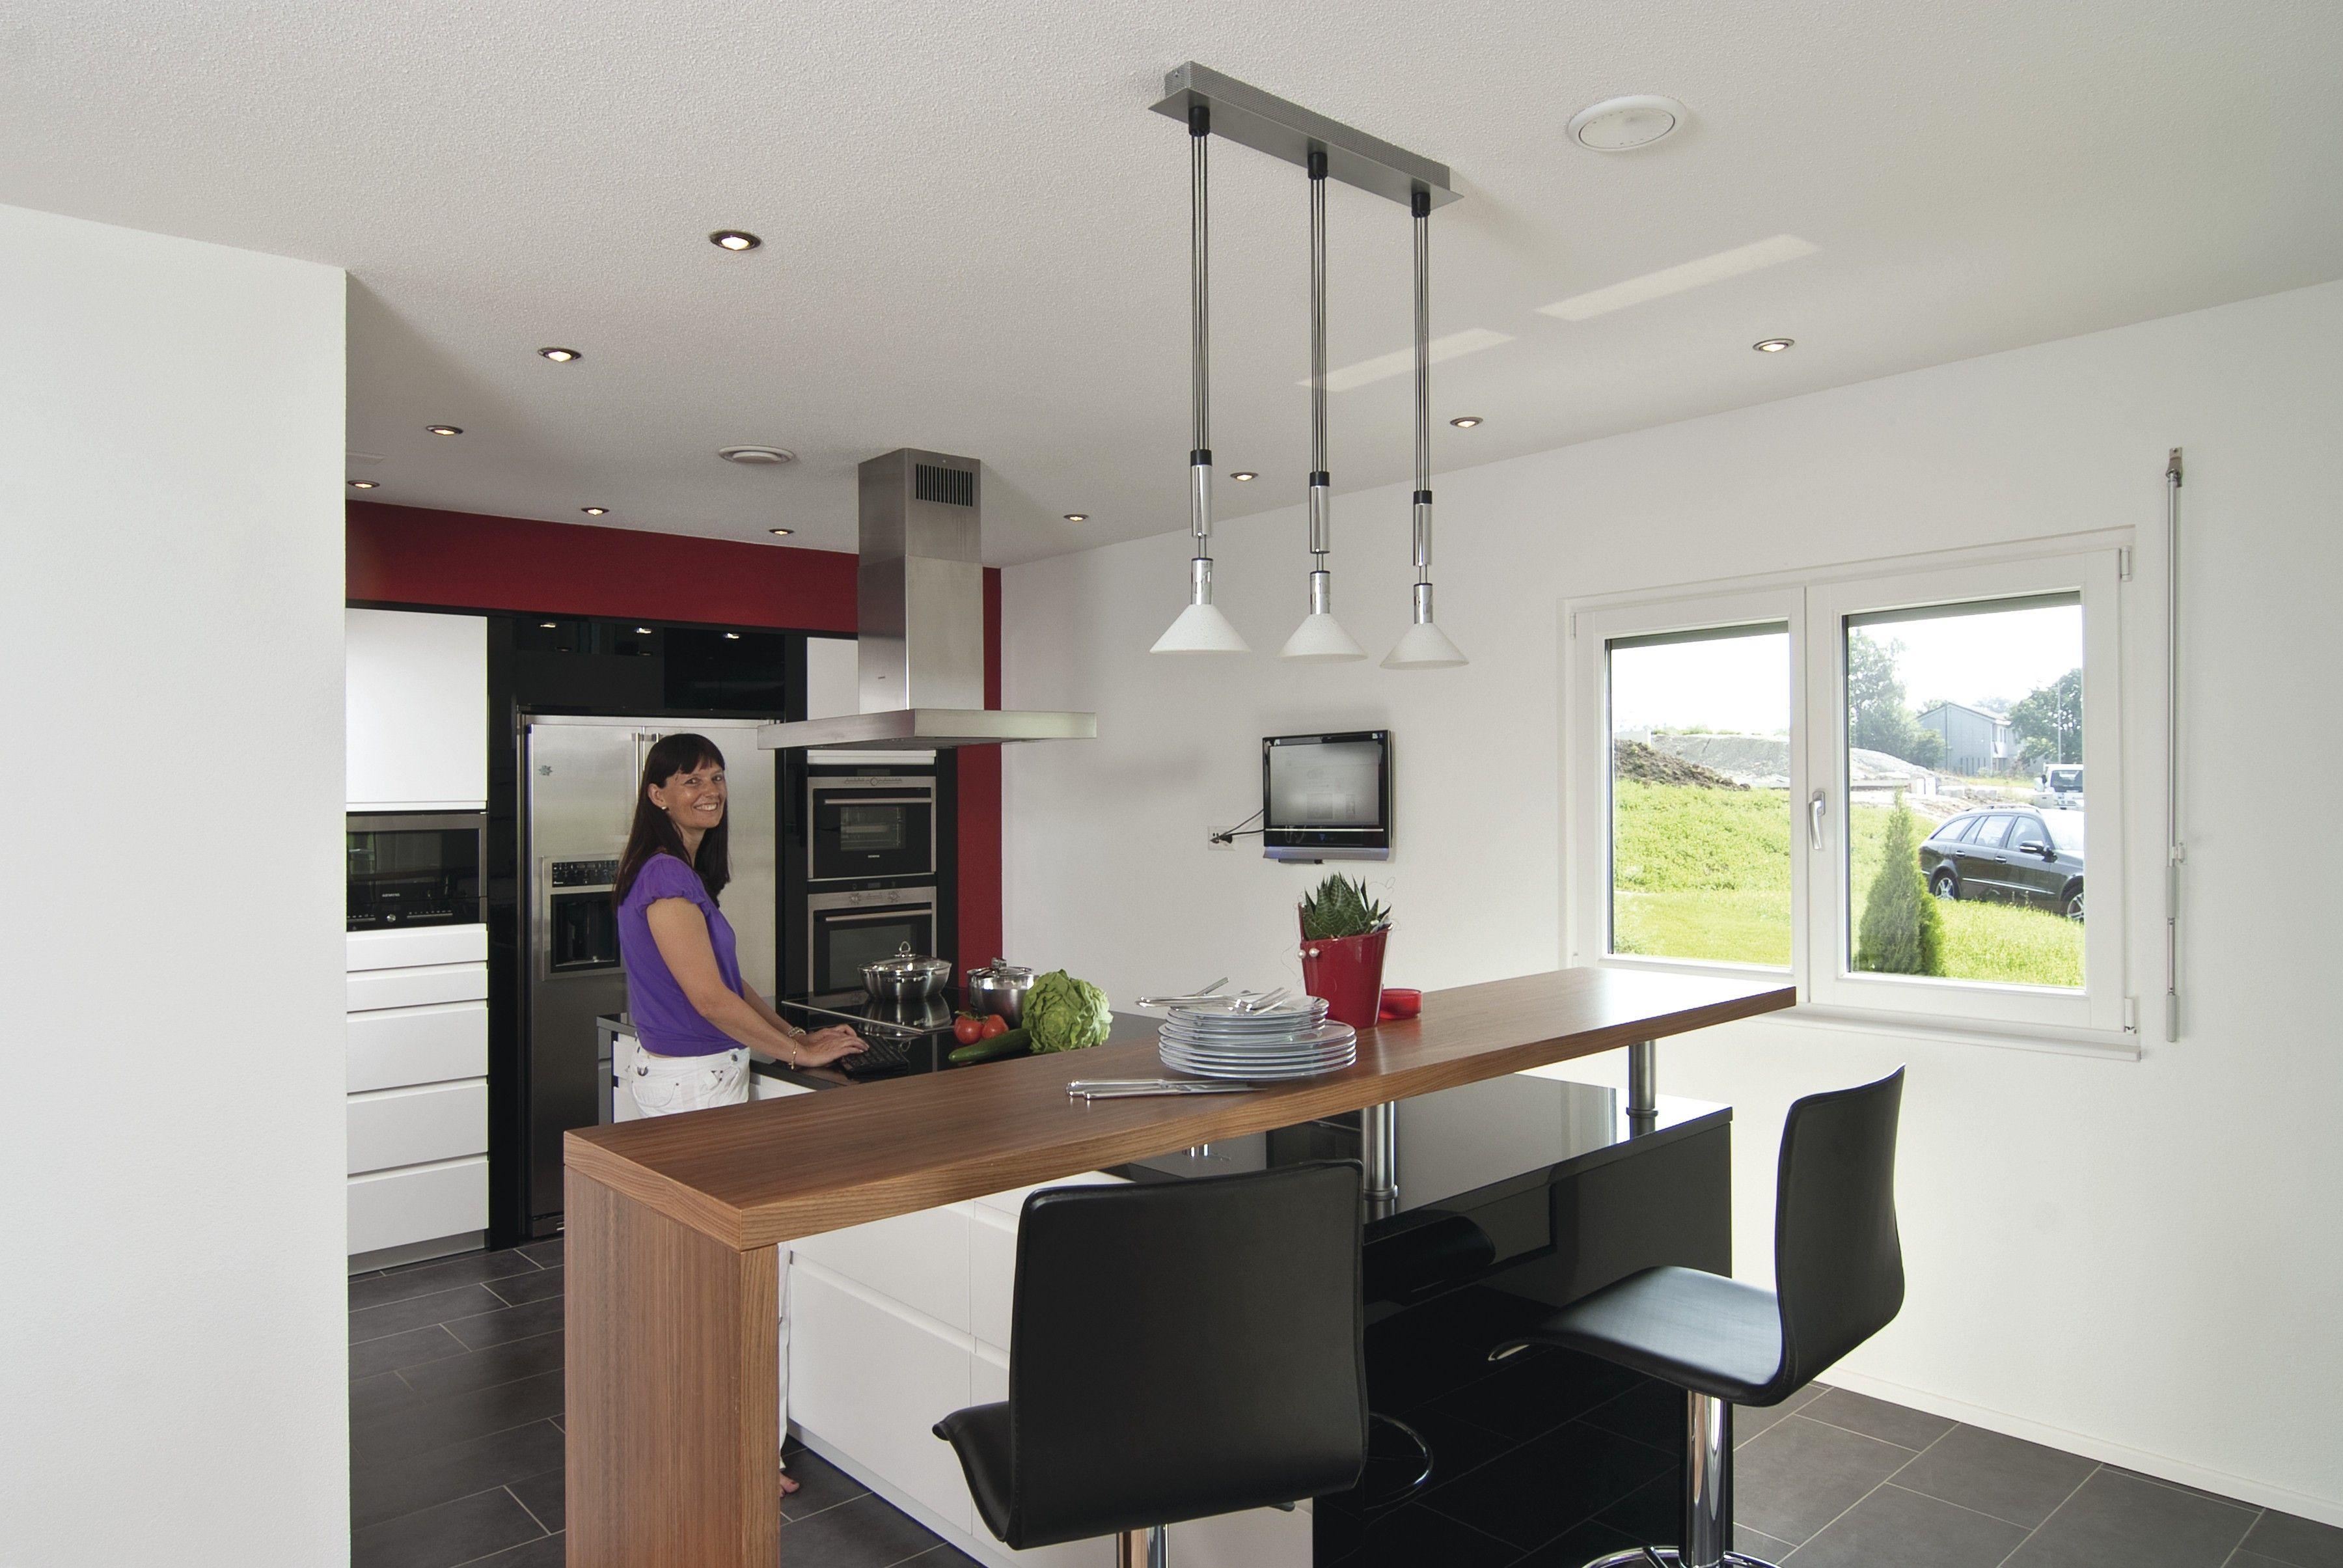 Kueche #kuecheninsel #weberhaus #kitchen weberhaus u2013 küchen